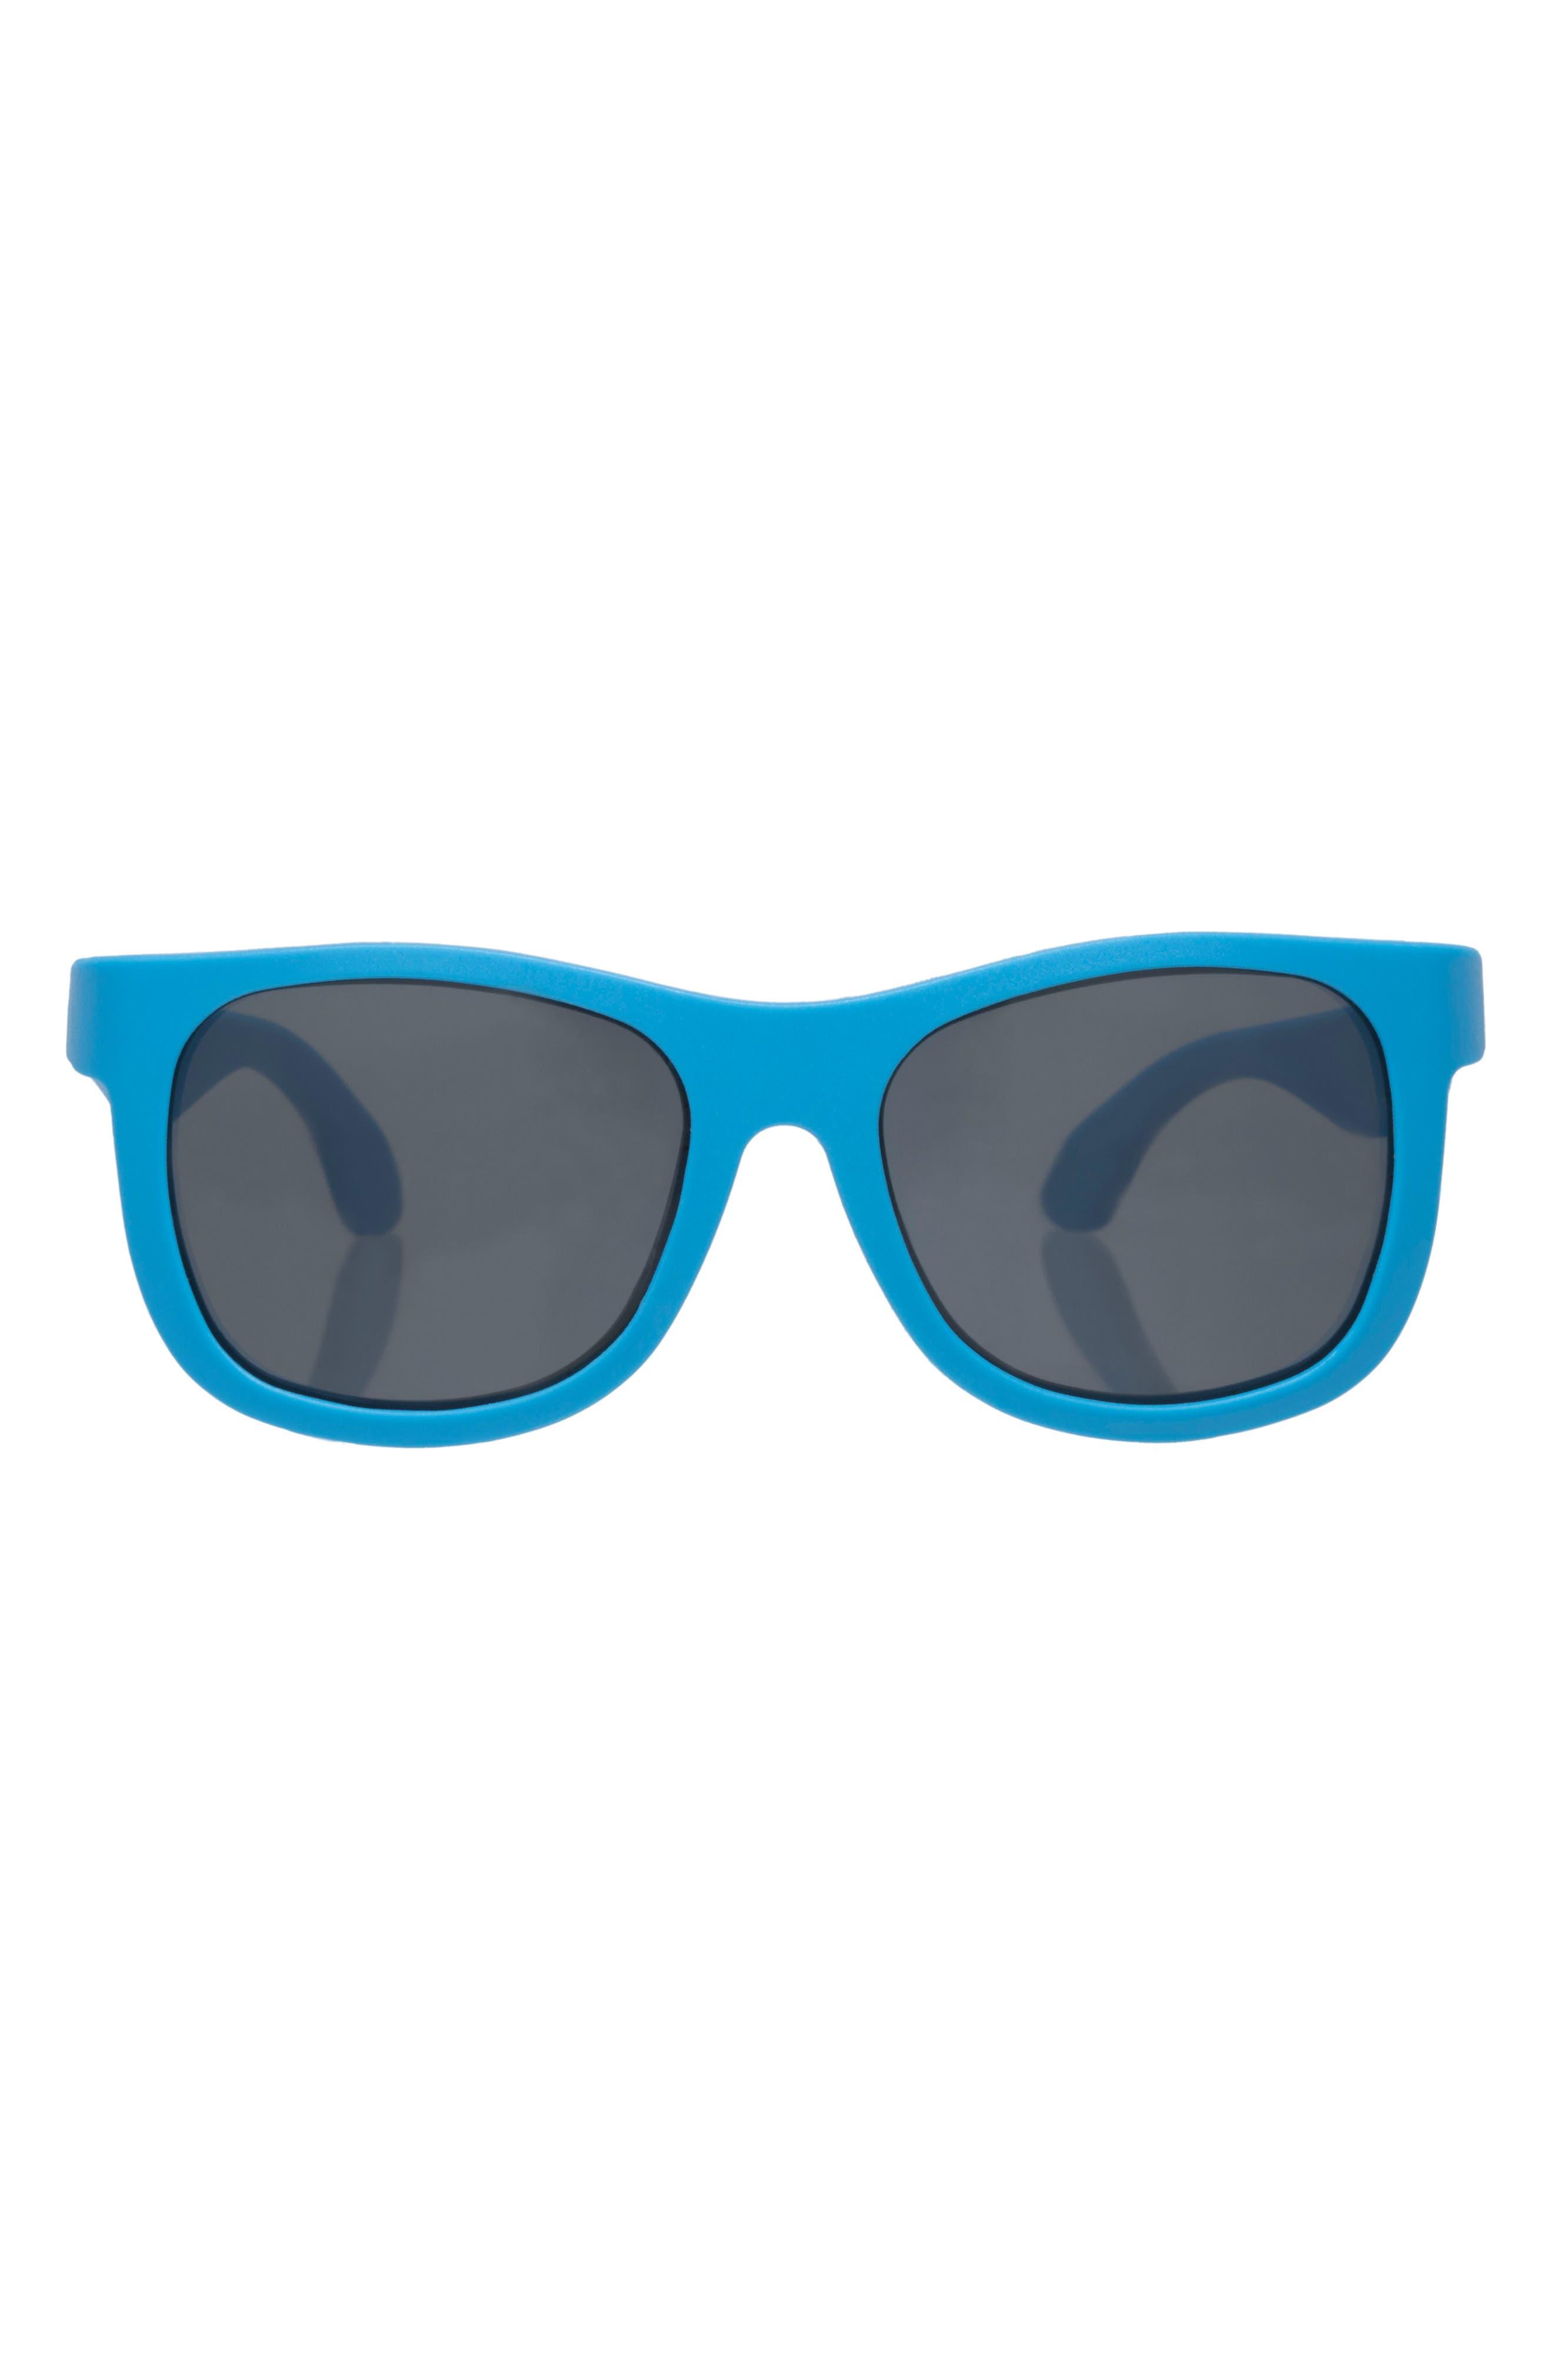 Original Navigators Sunglasses,                         Main,                         color, Blue Crush